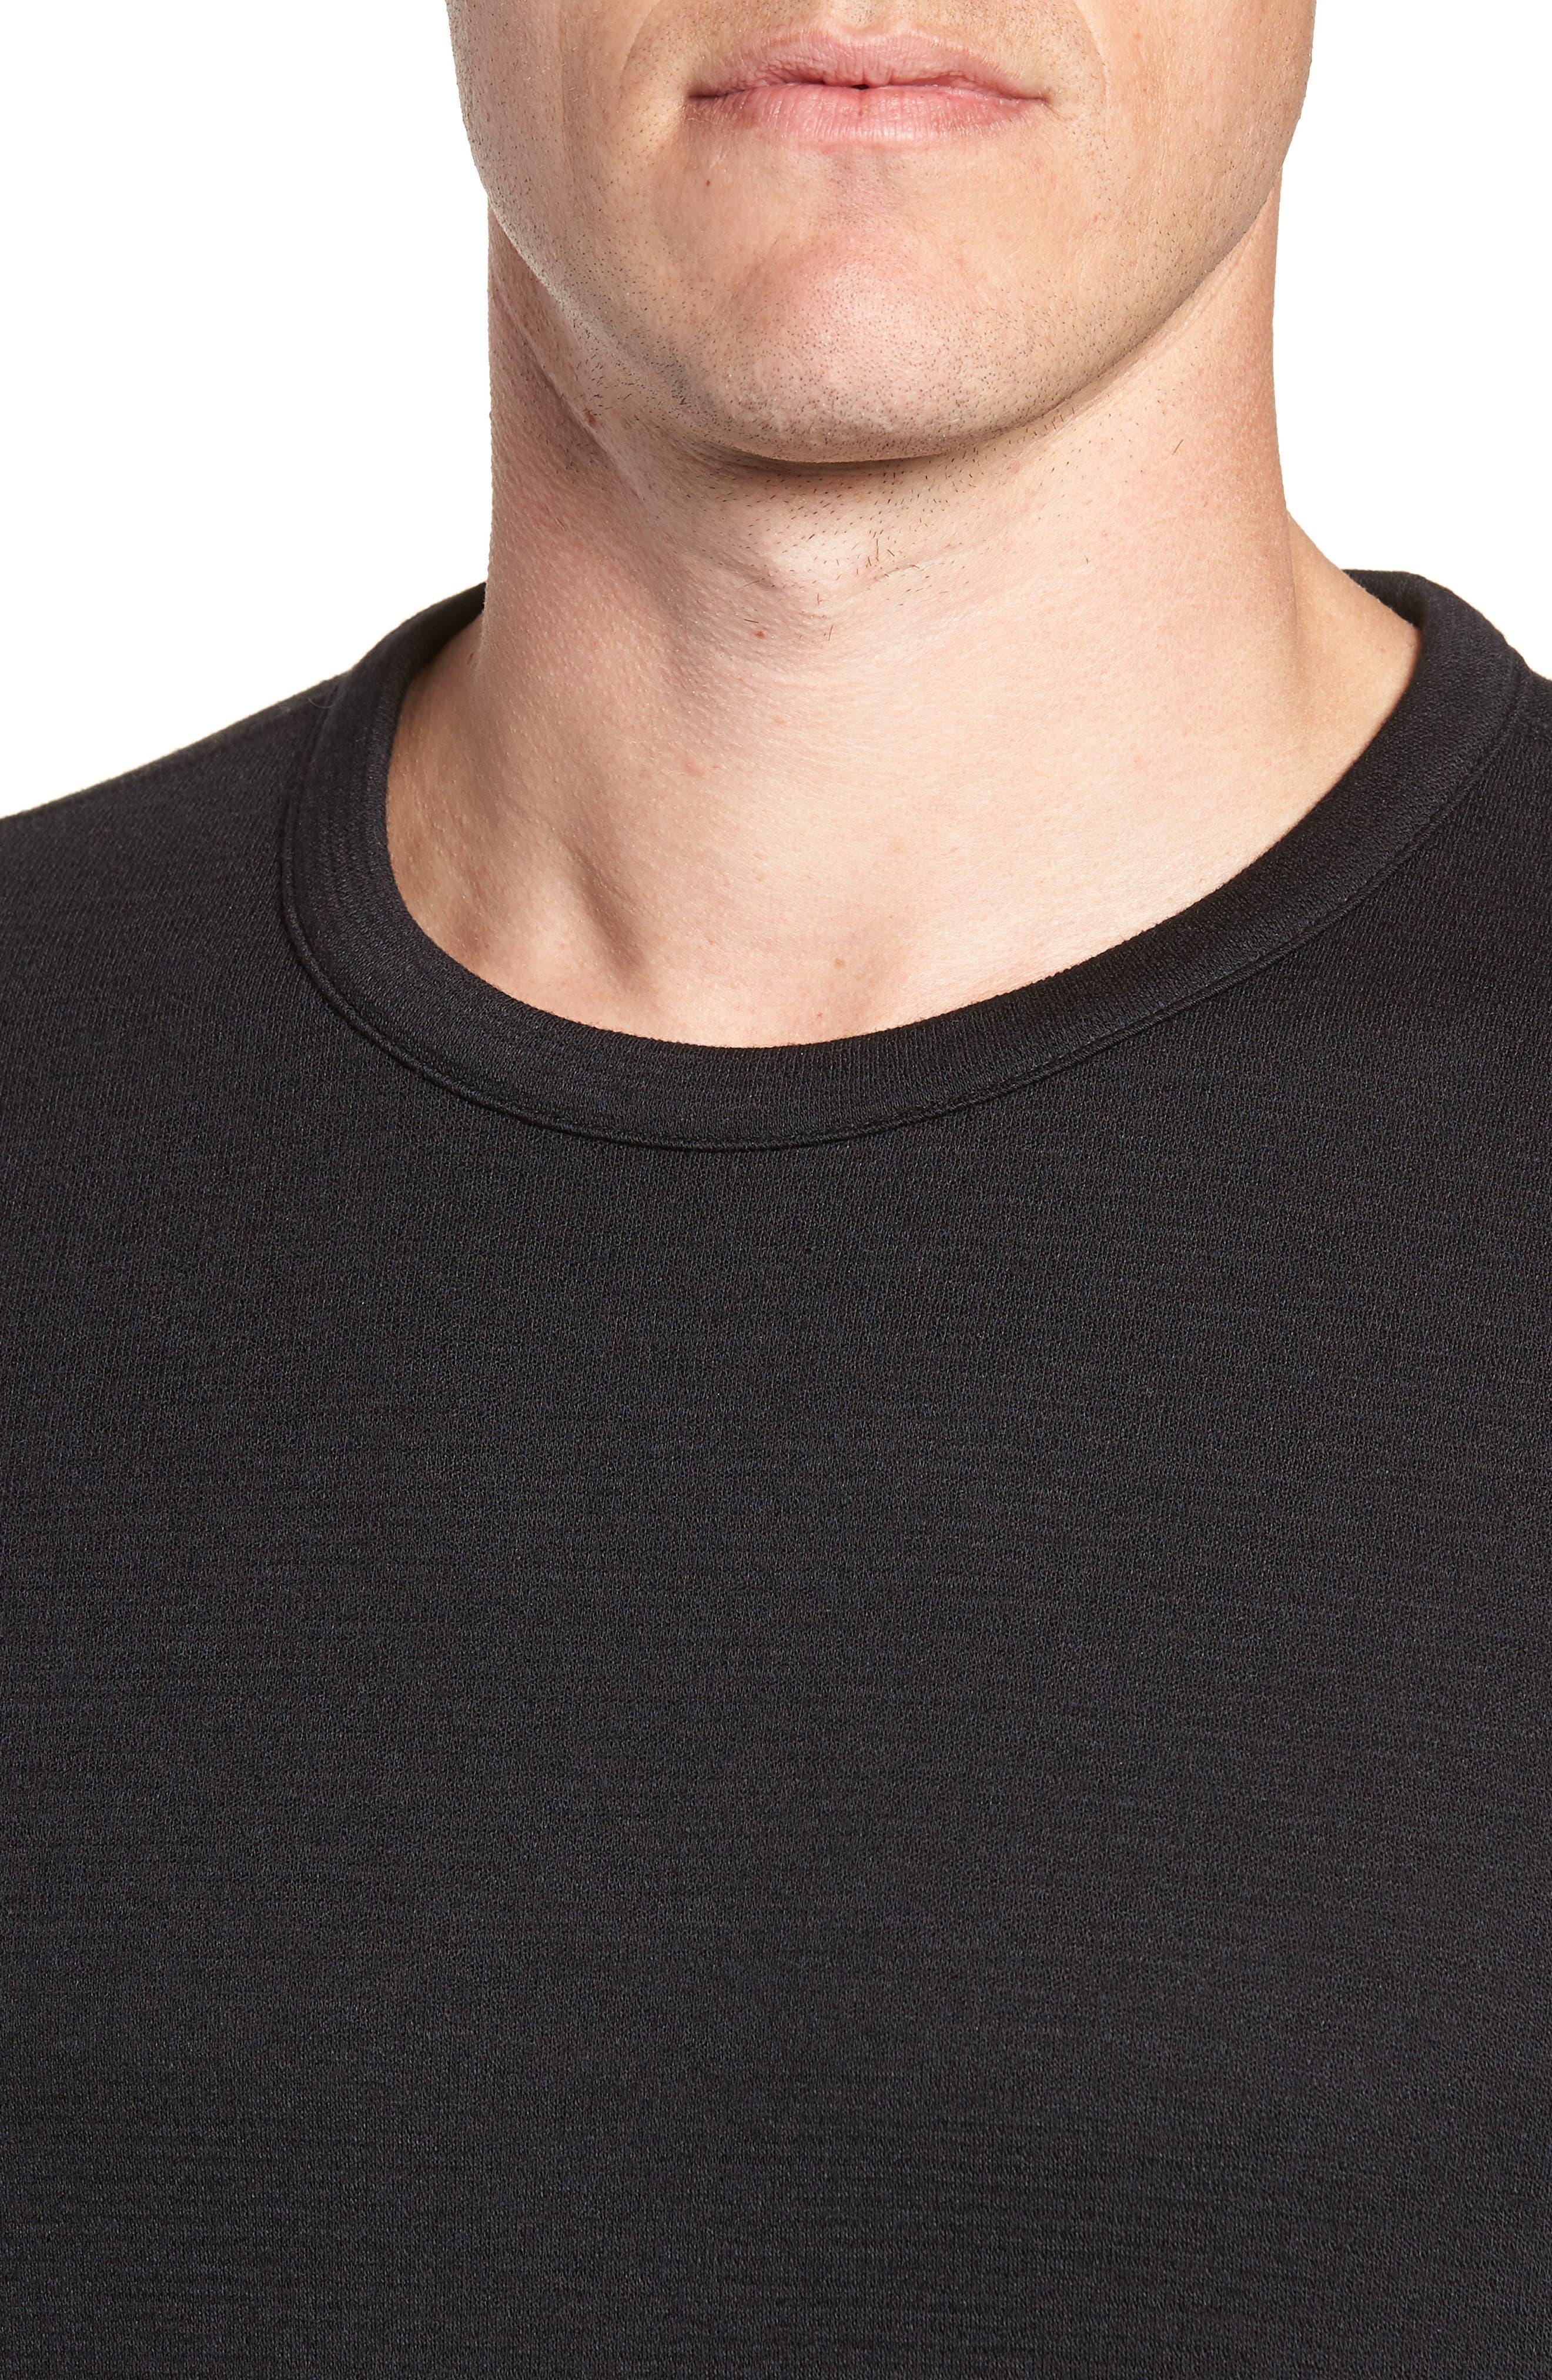 Crewneck Sweater,                             Alternate thumbnail 5, color,                             BLACK CAVIAR